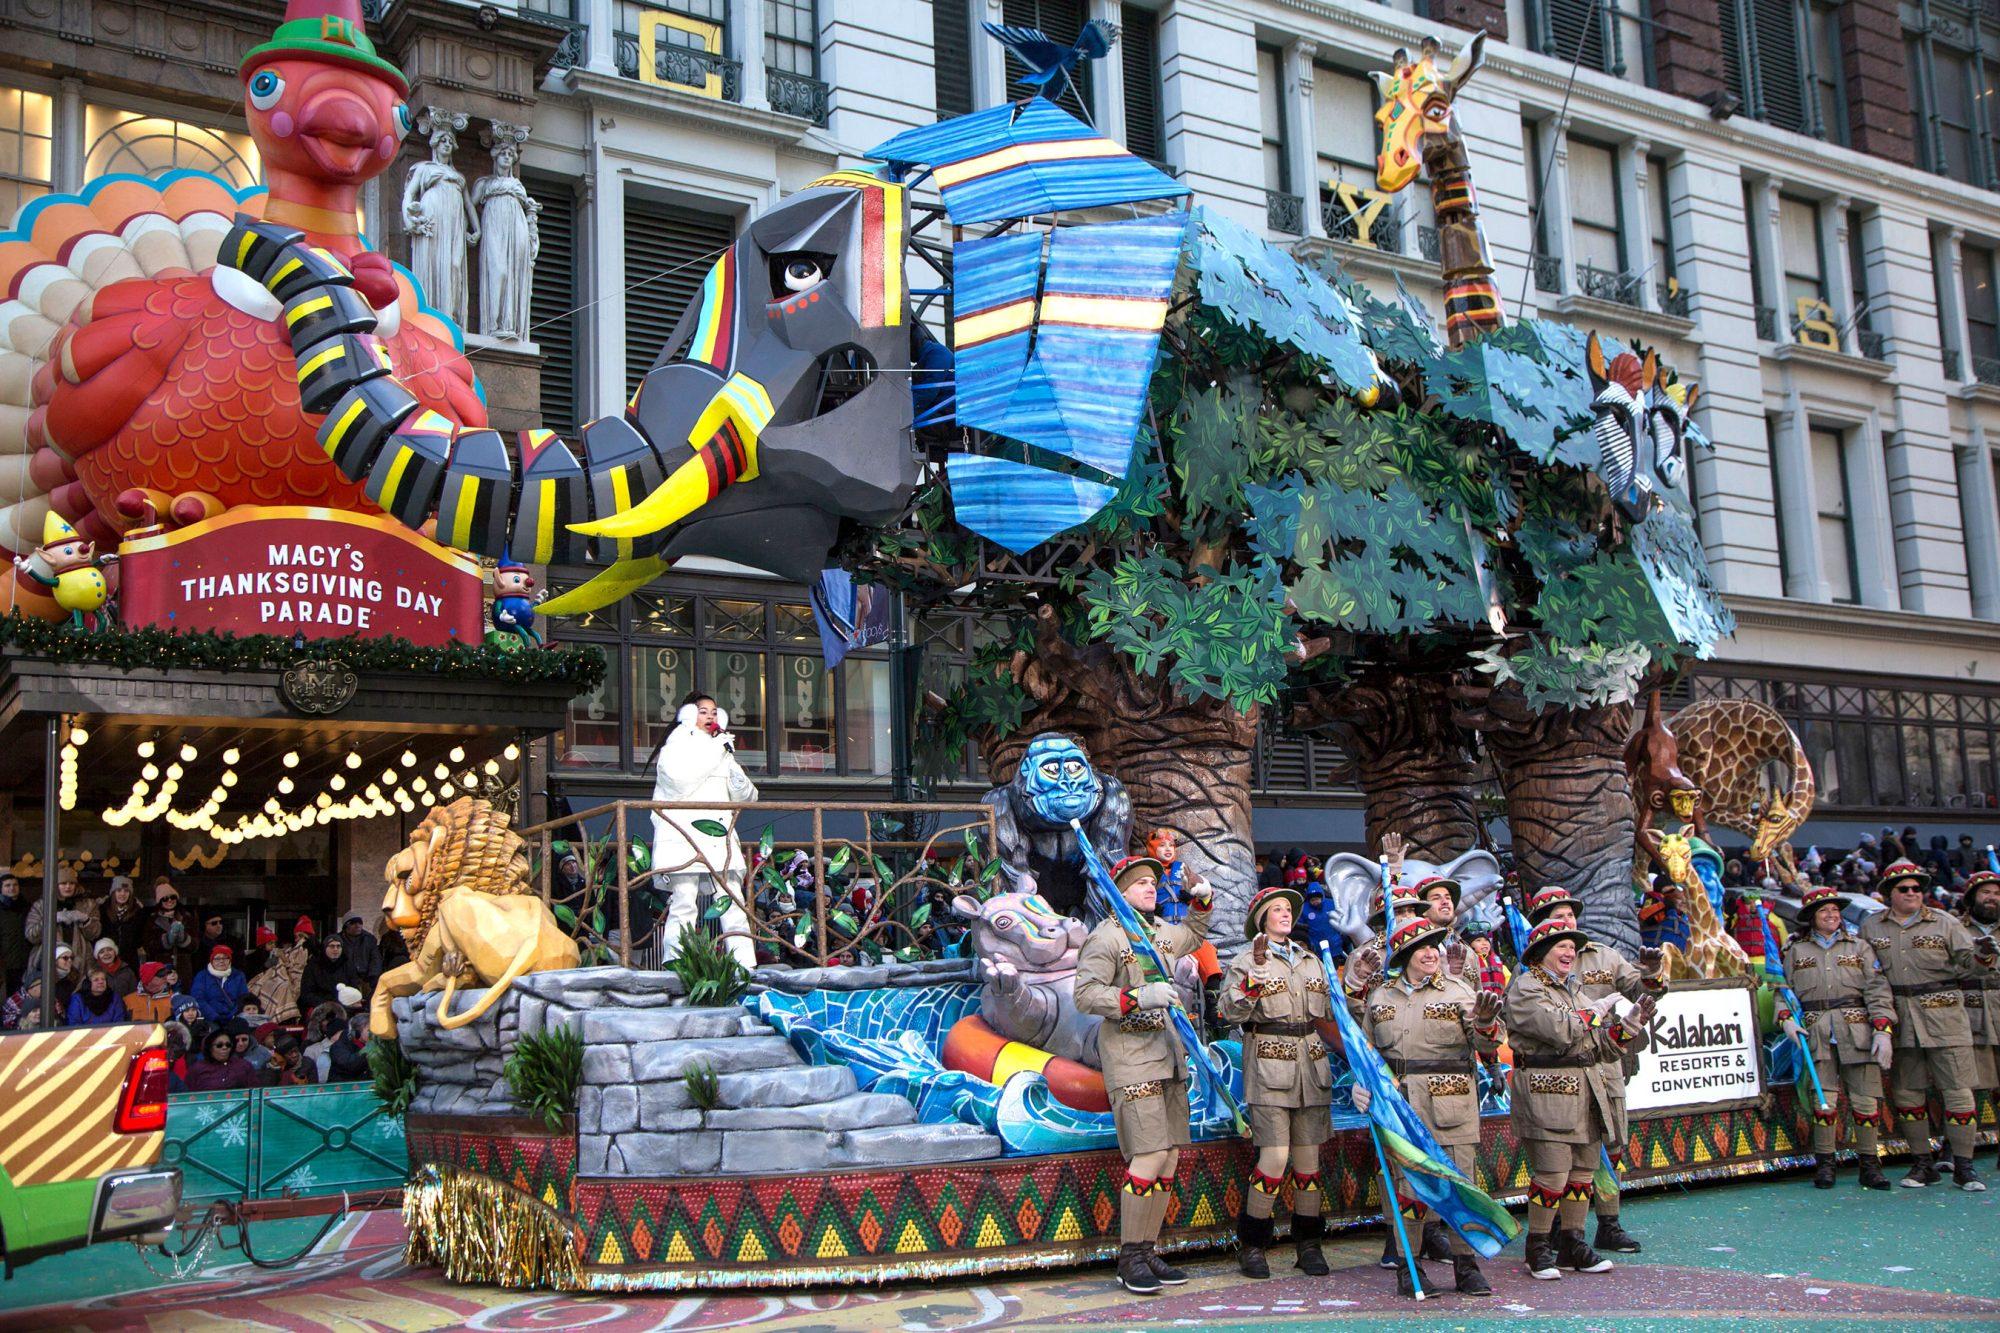 Macy's Thanksgiving Day Parade - Season 92